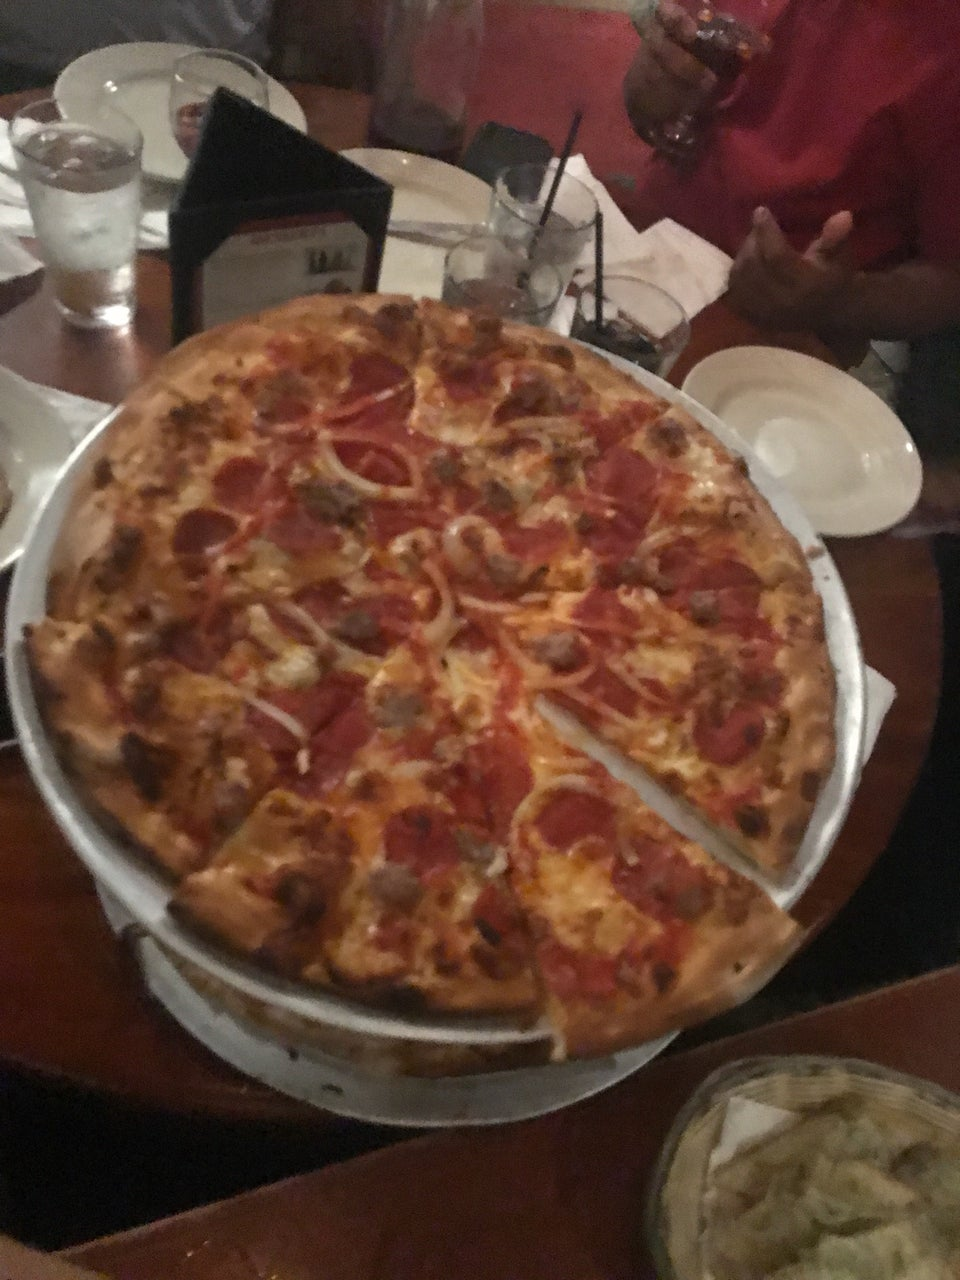 Photo of John's Pizzeria Times Square